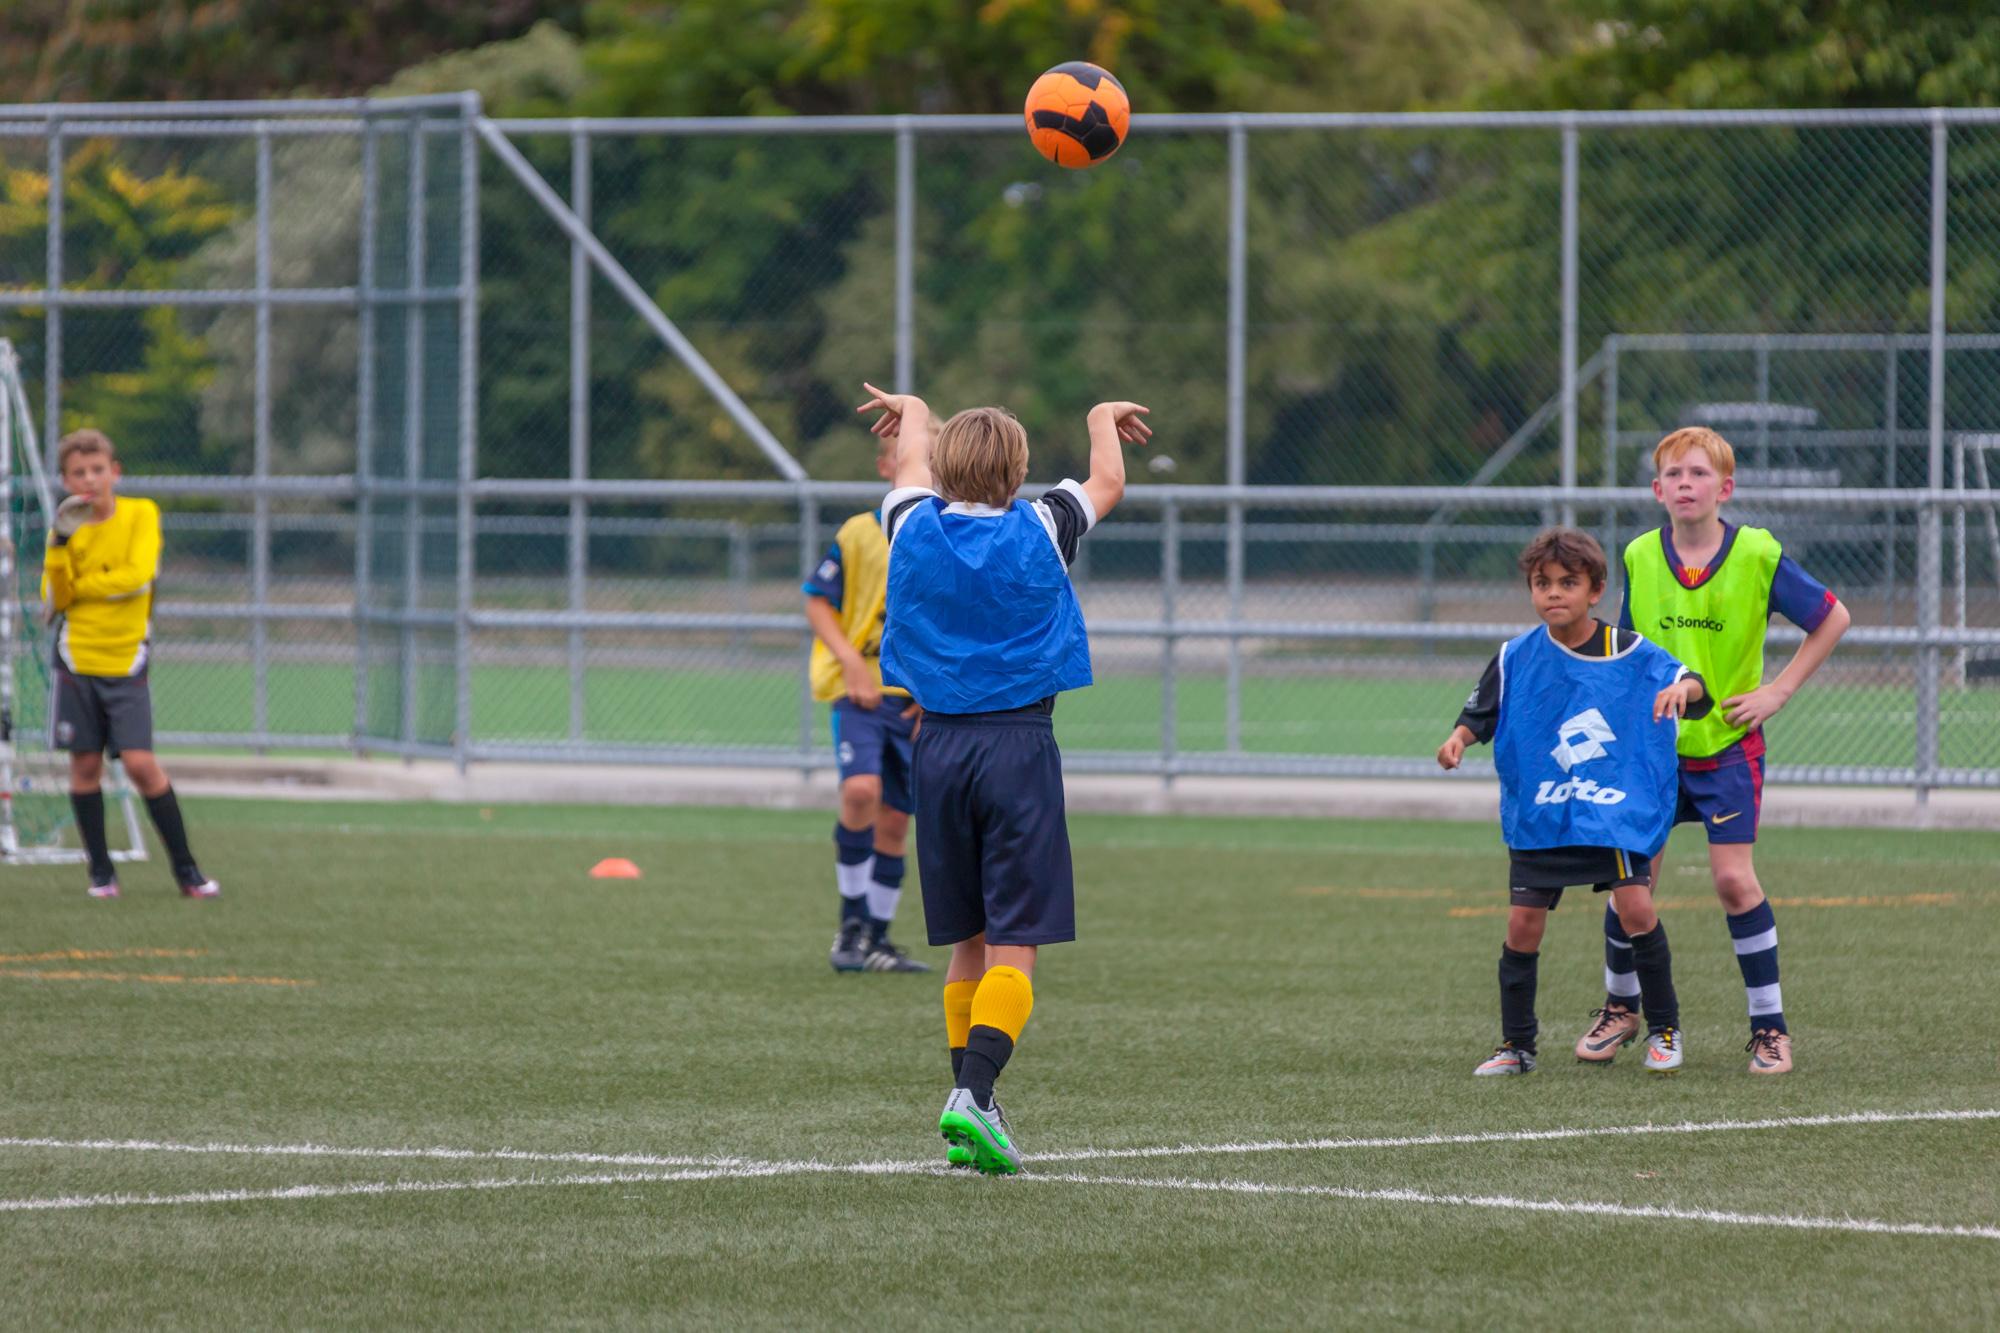 UHCC Soccer Coach 4450